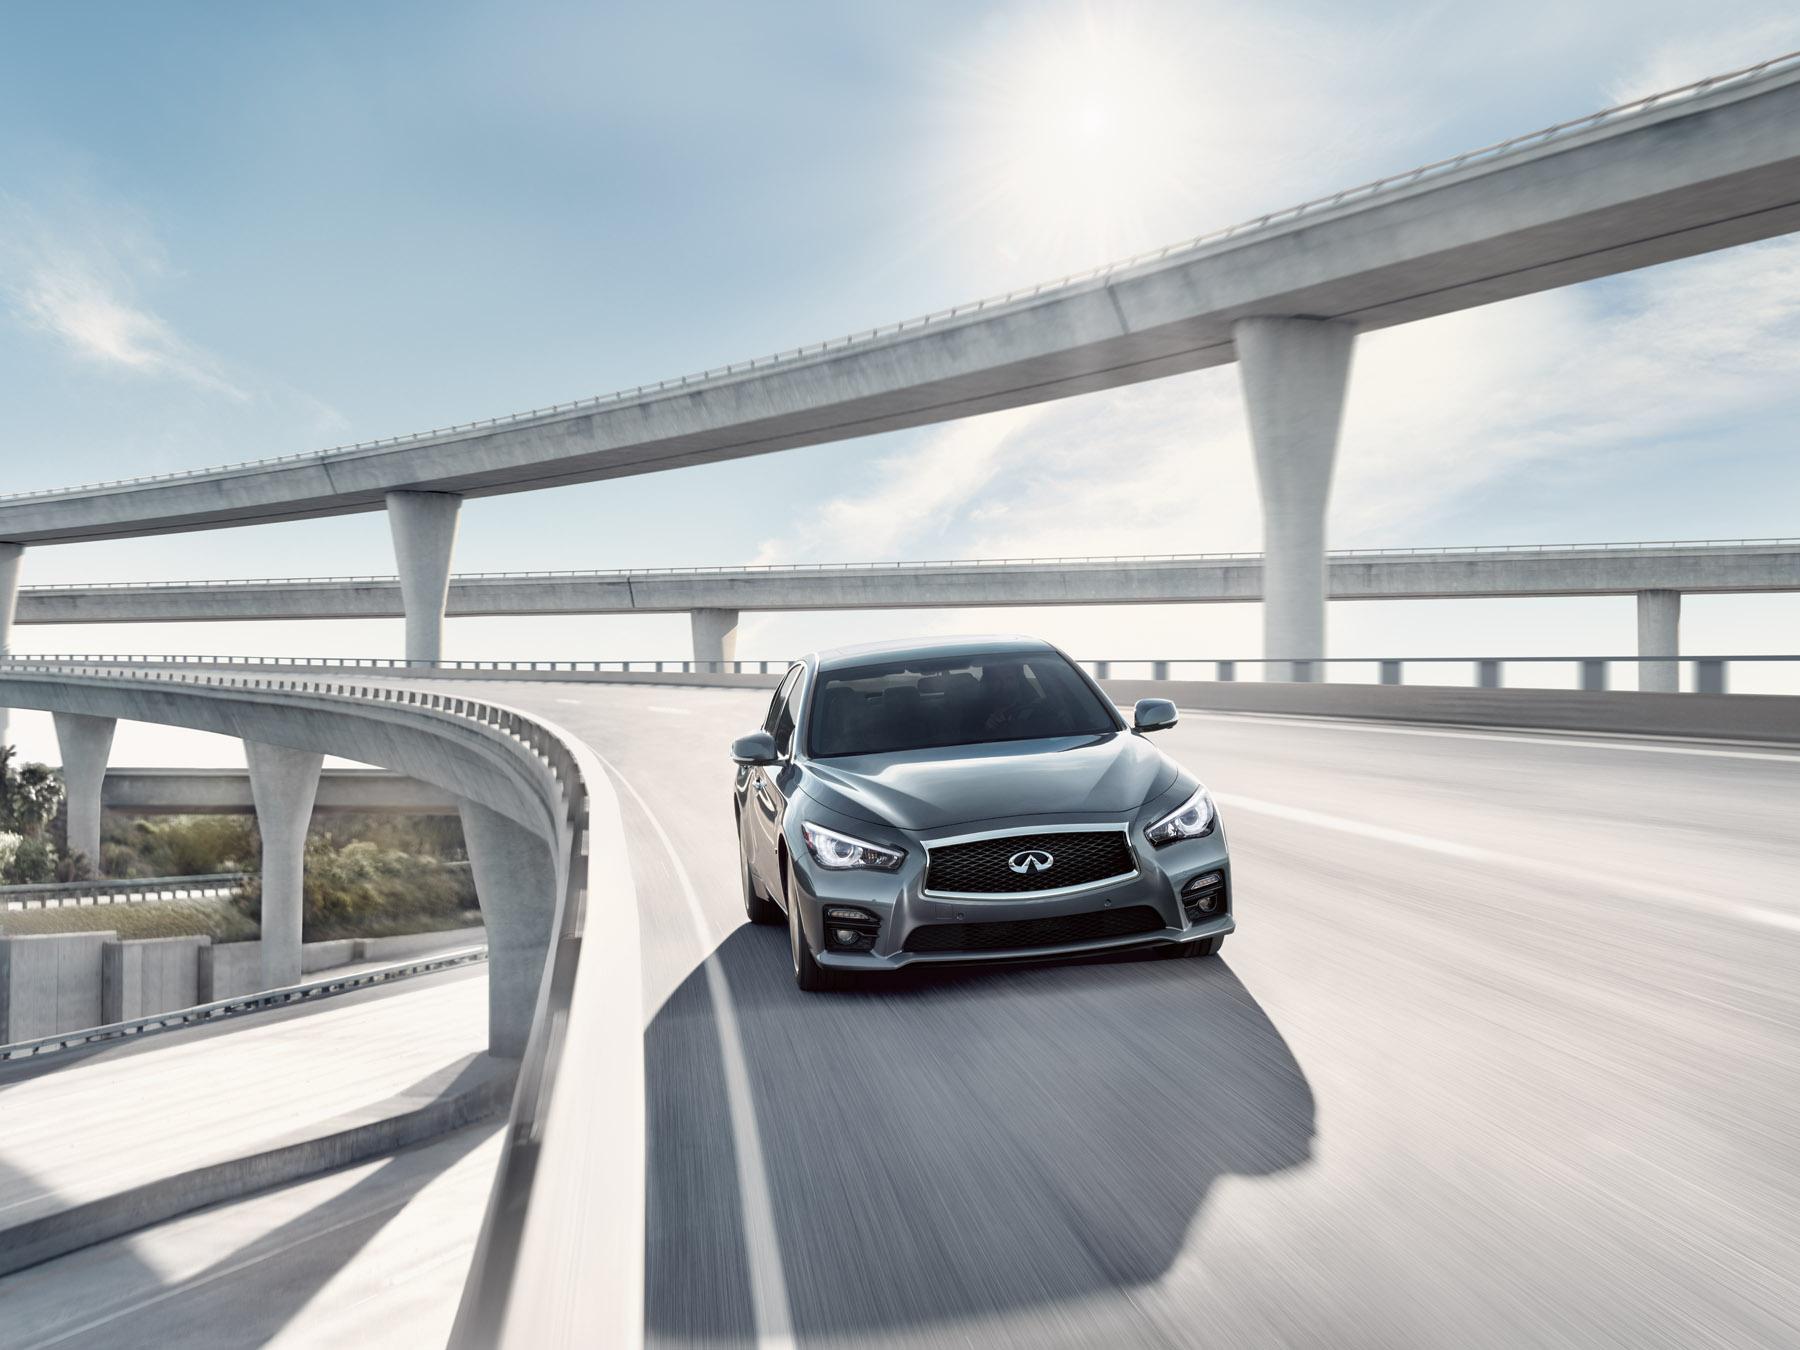 Grey Infiniti Q50 driving on the highway